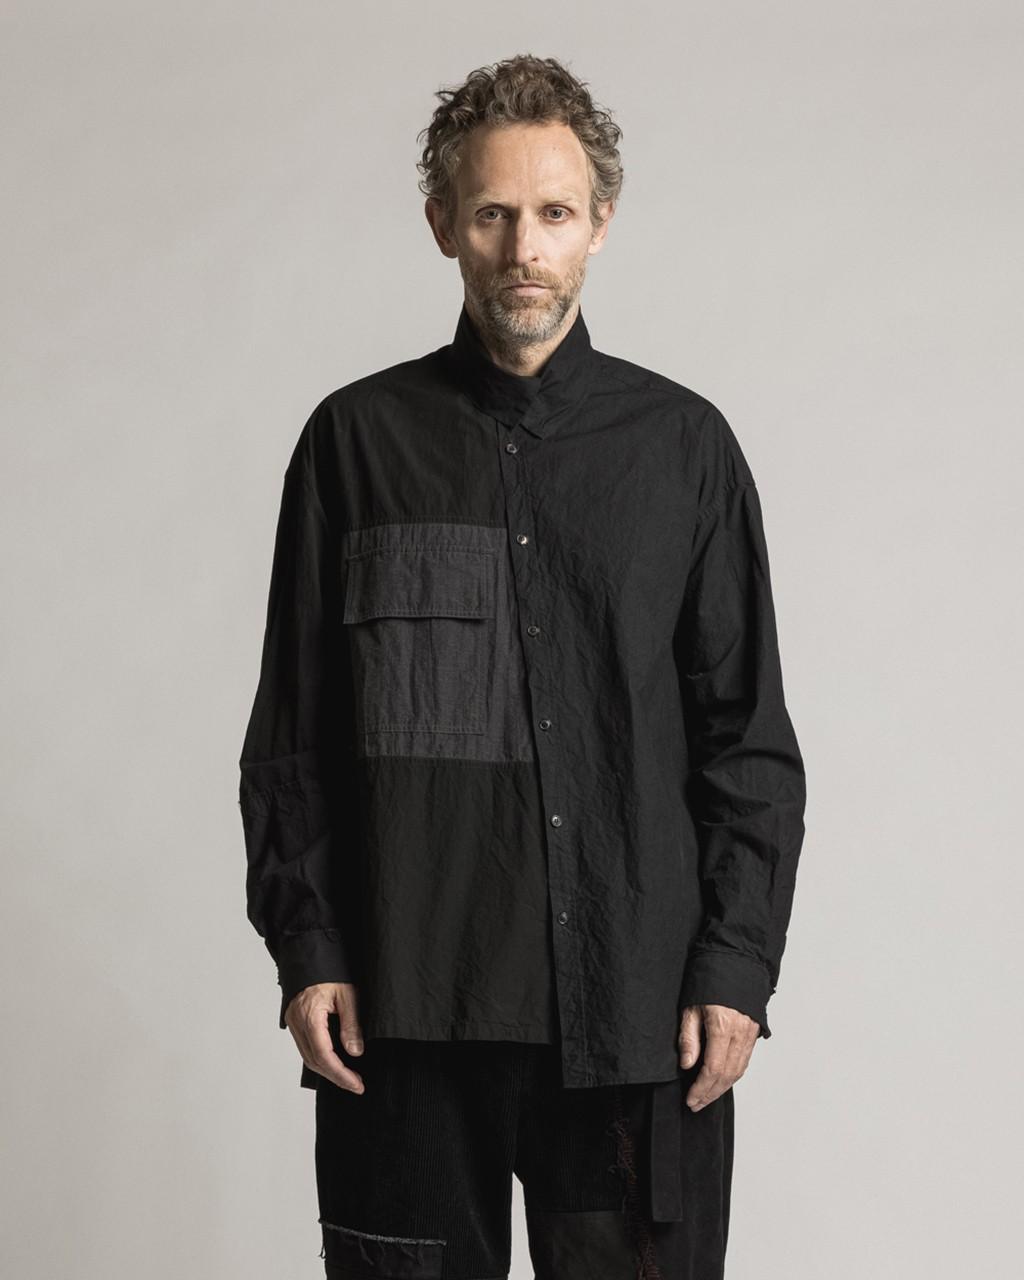 21AW DUE-Ⅲ-033-SHT-BLK Diagonal Shirt